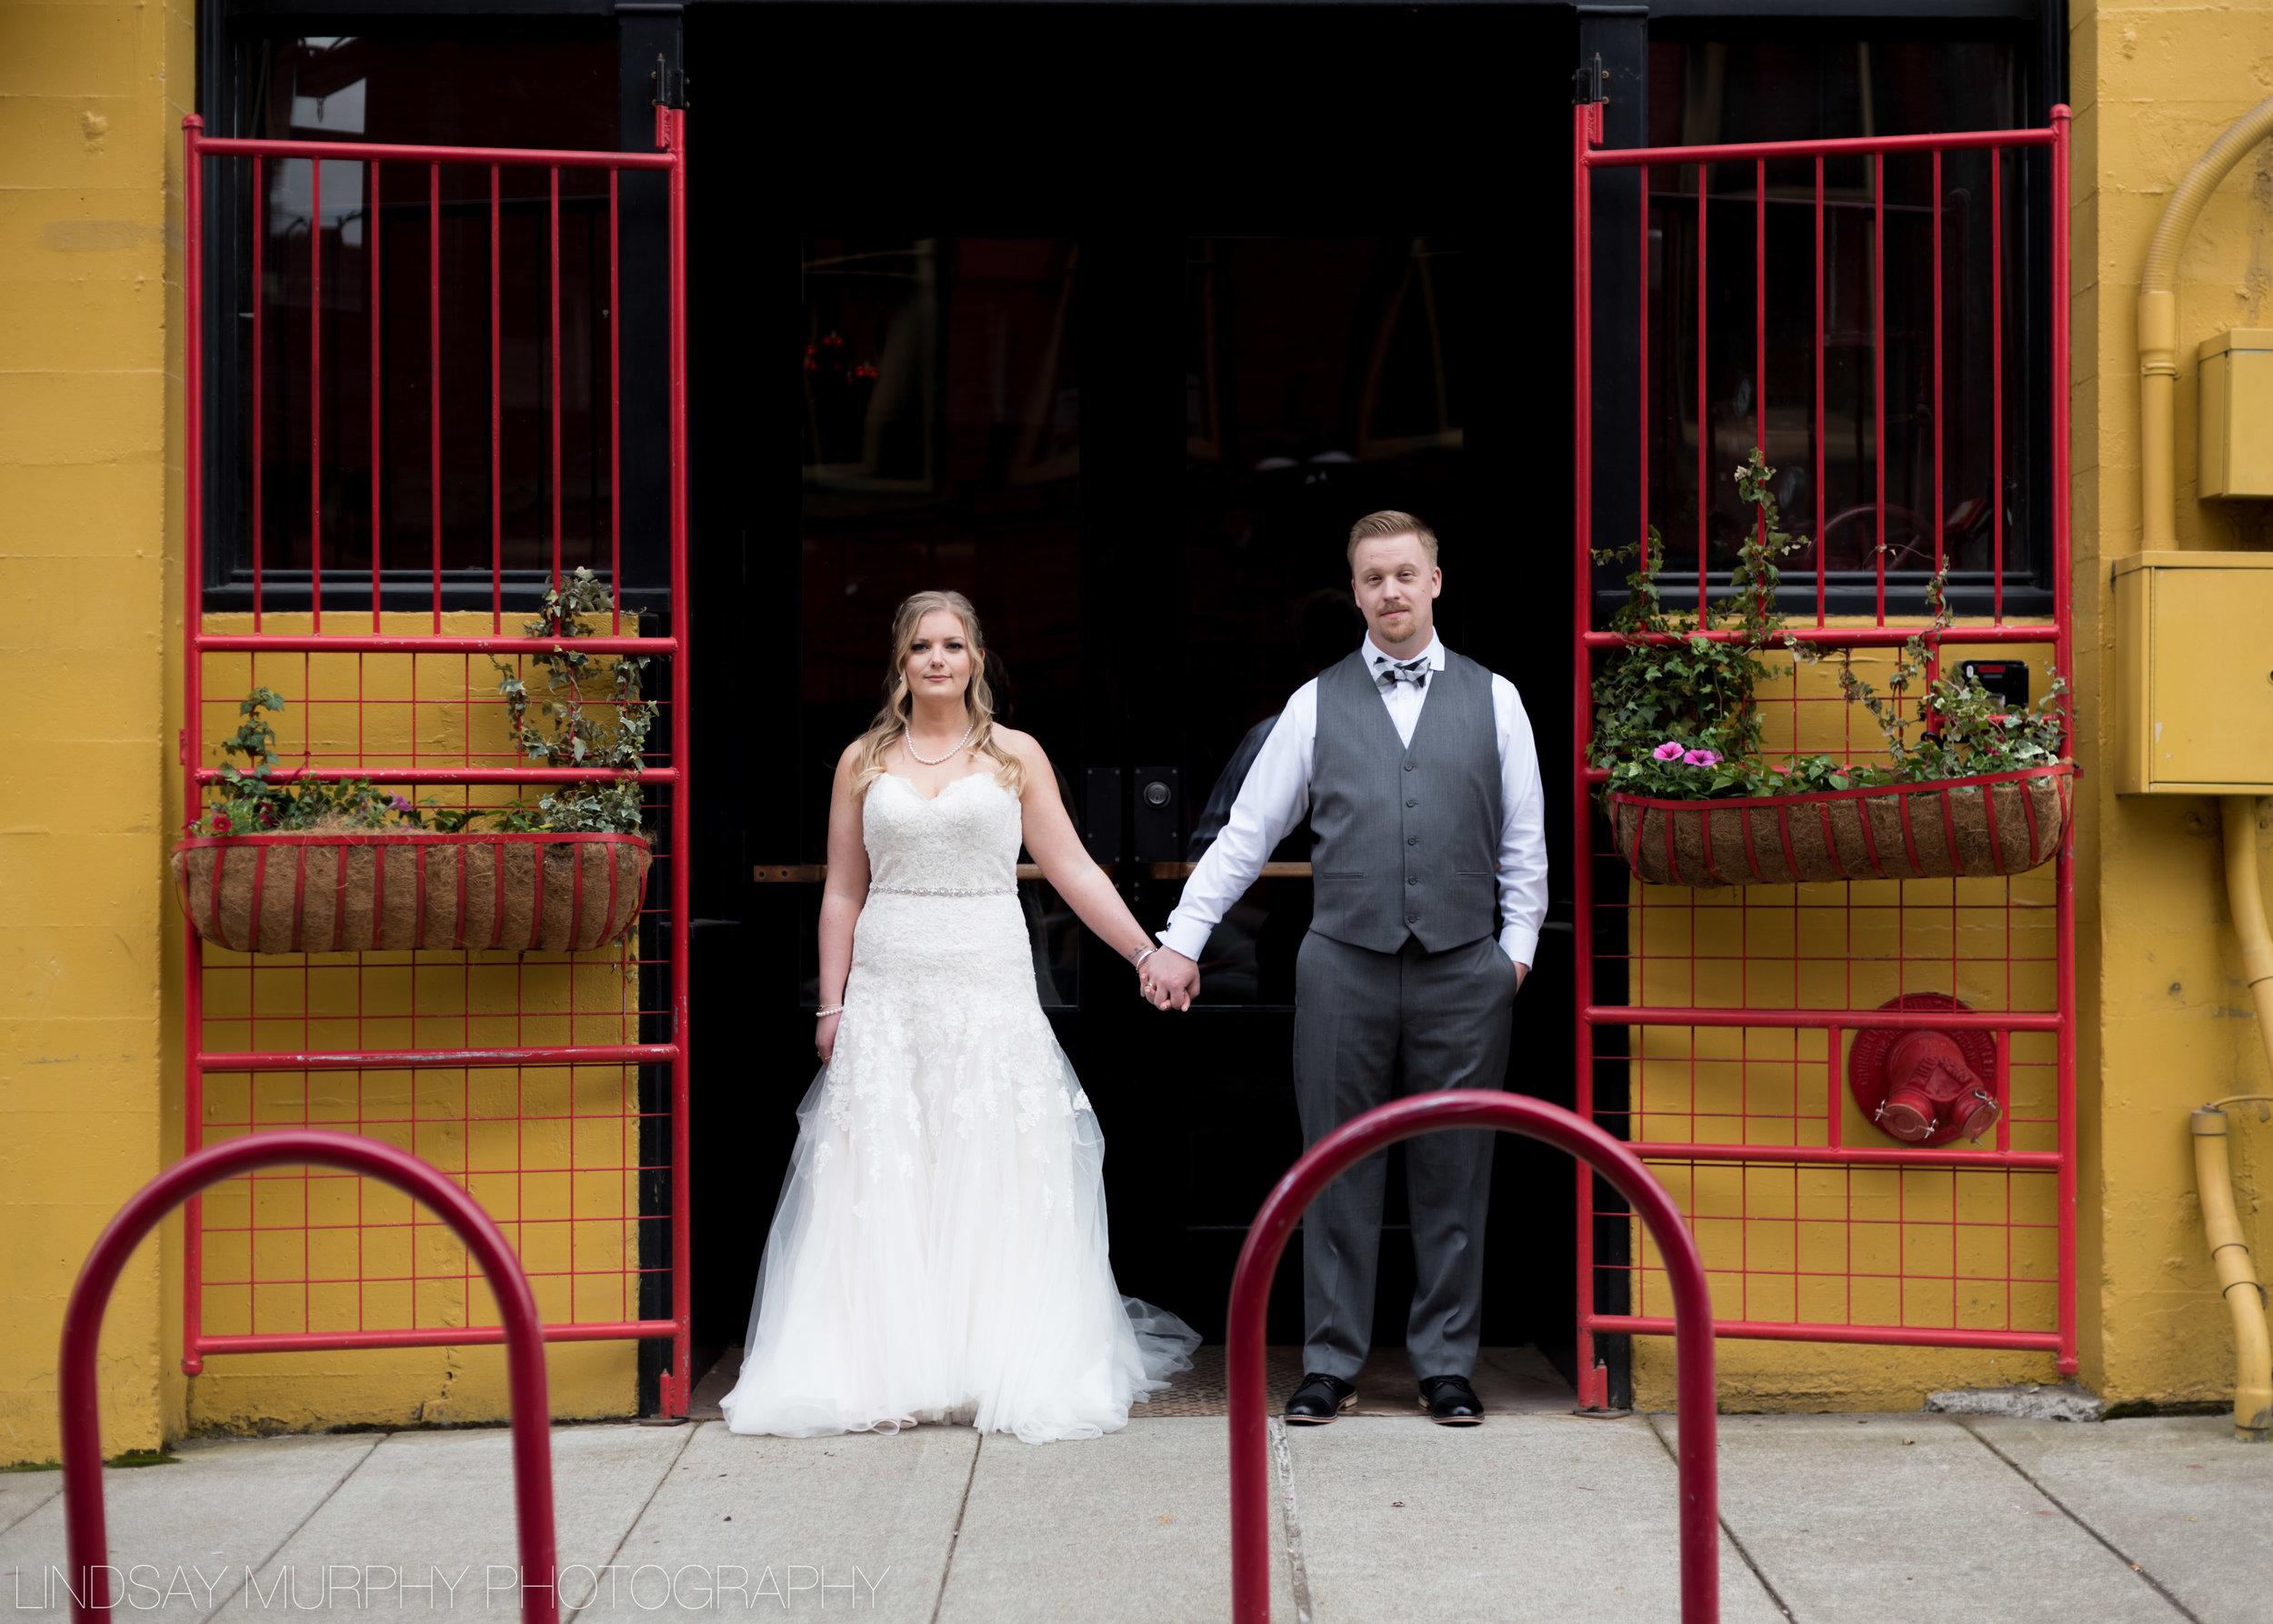 Tacoma_Wedding_photography-58.jpg